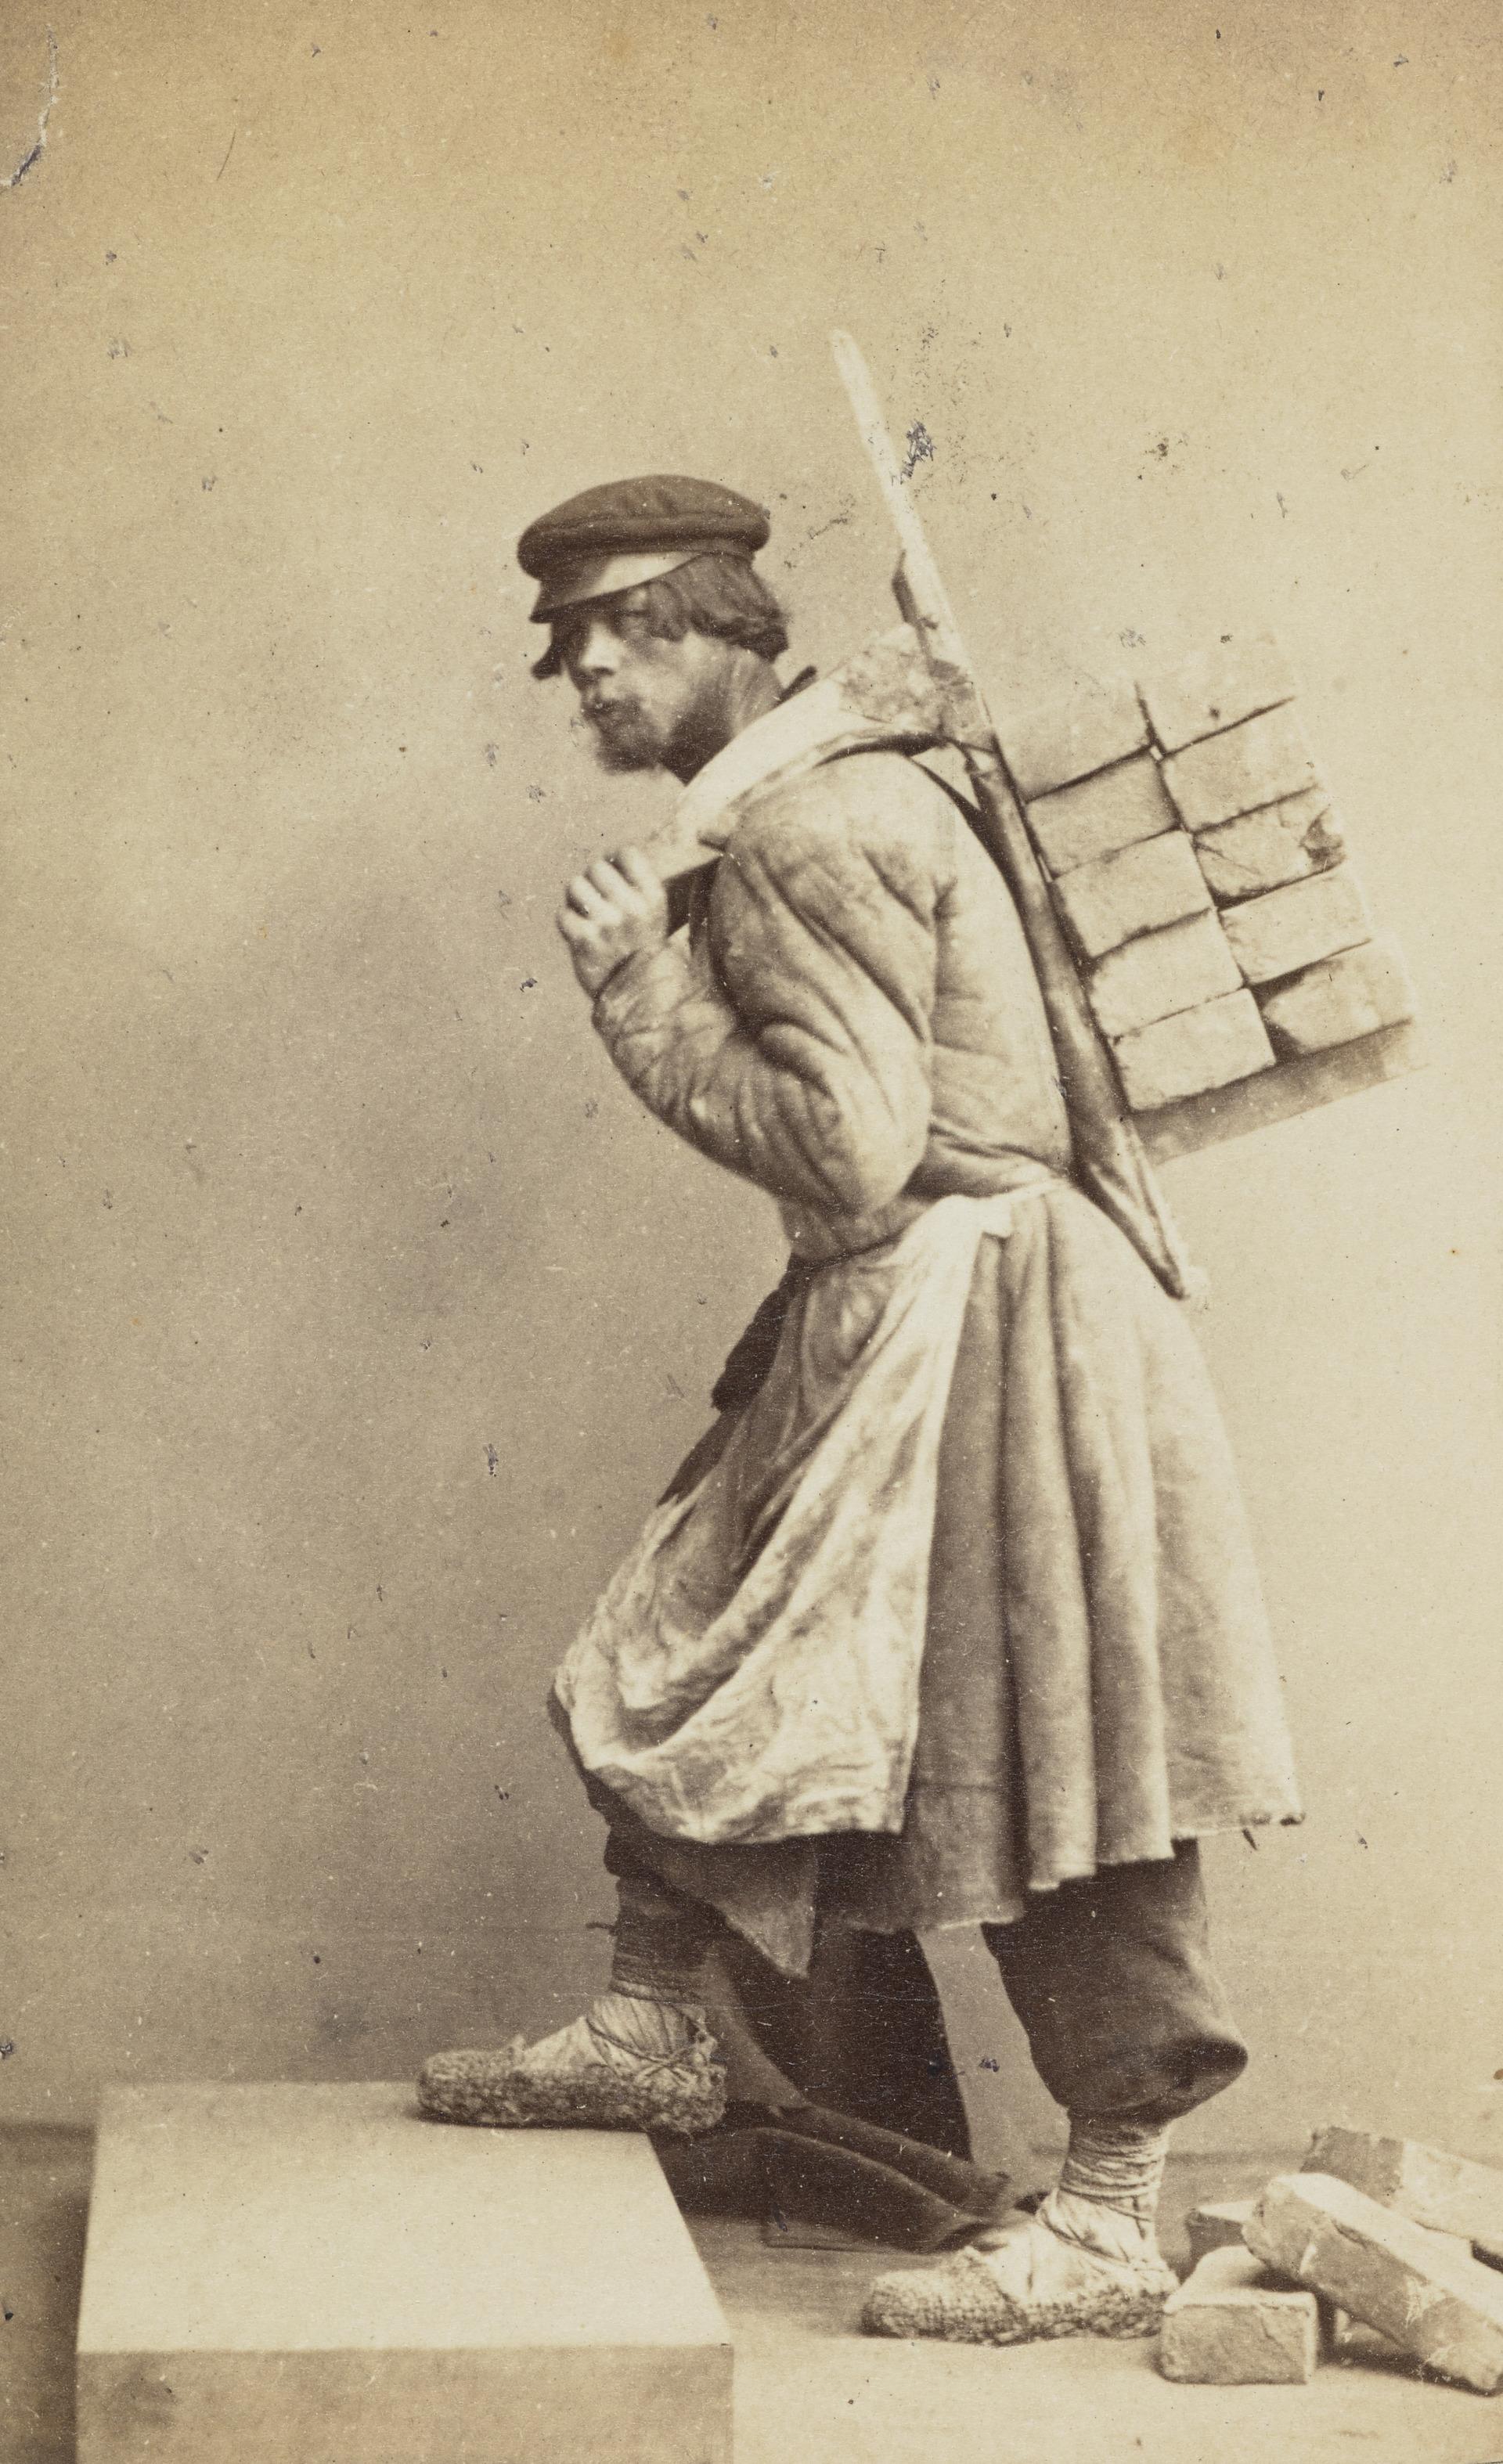 Каменщик с кирпичами